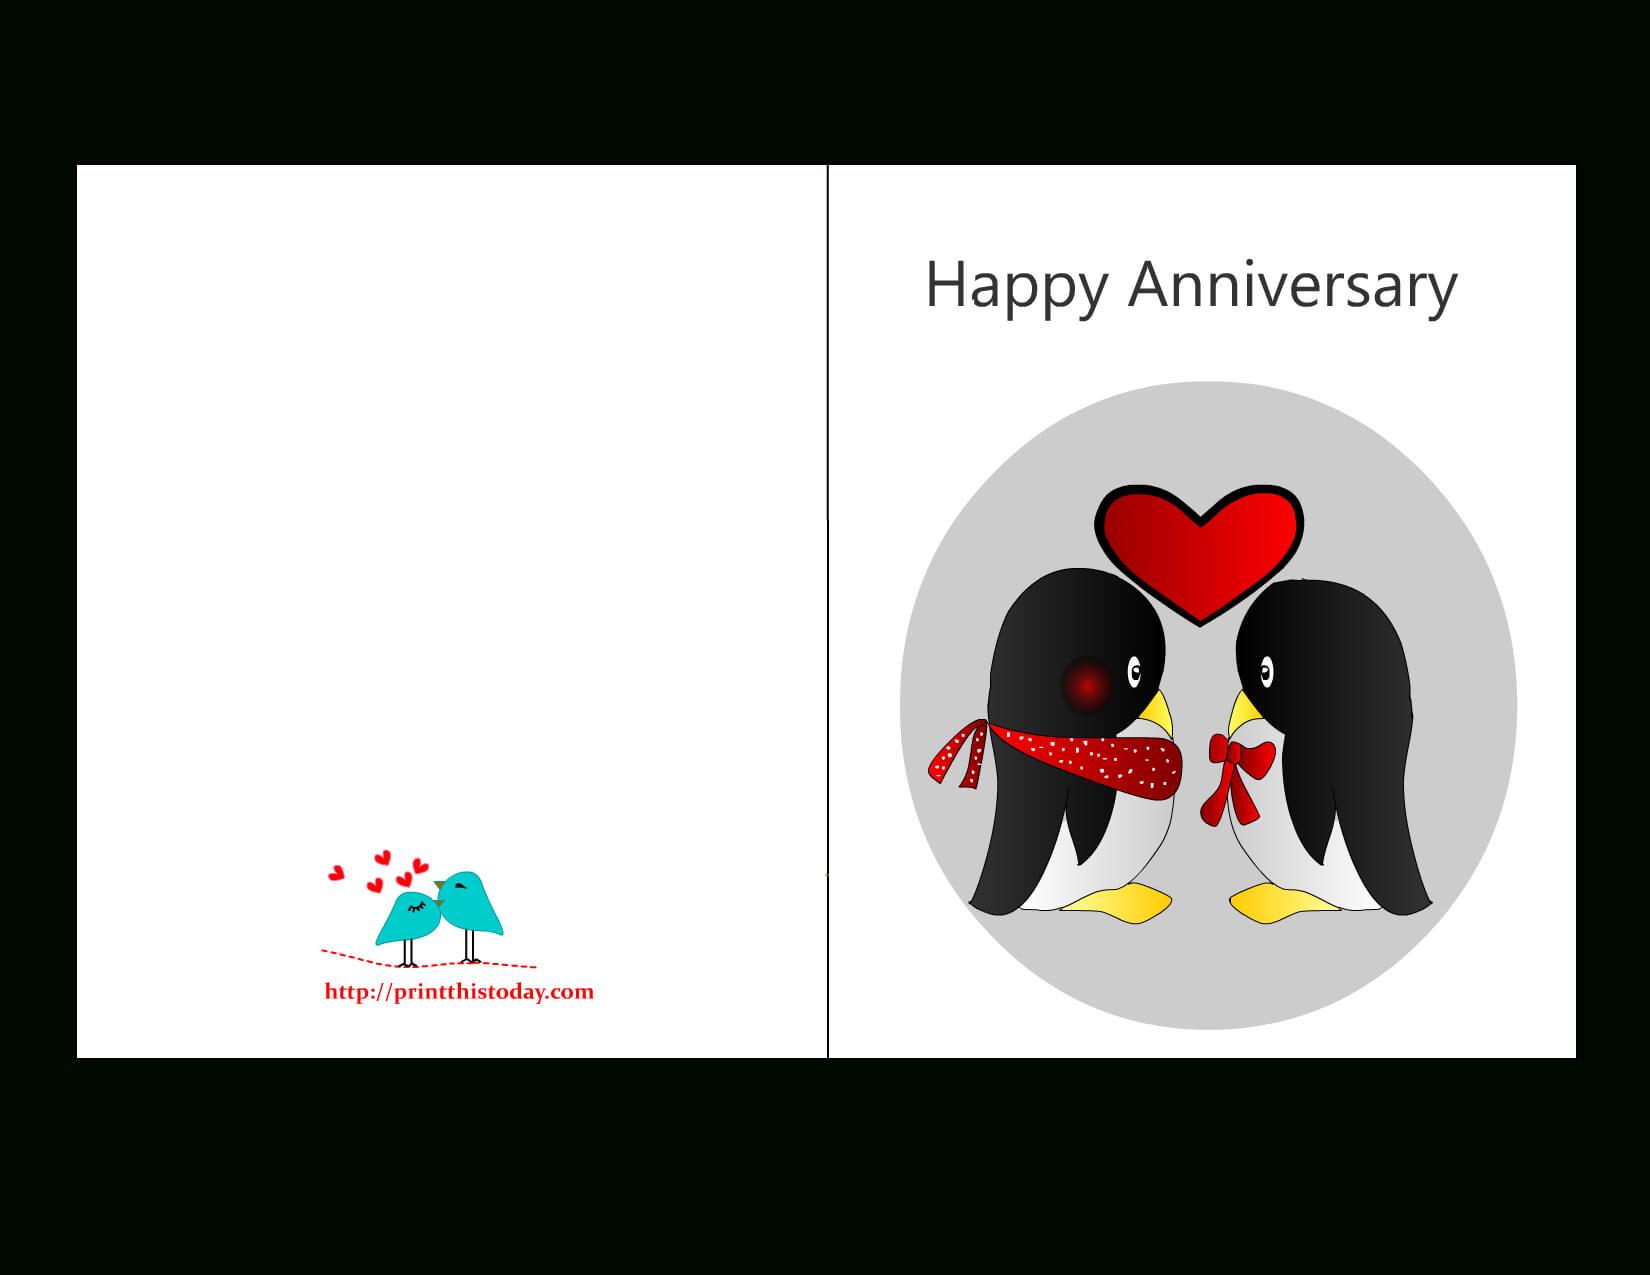 Anniversary Card Templates 12 Free - Anniversary Card In Word Anniversary Card Template